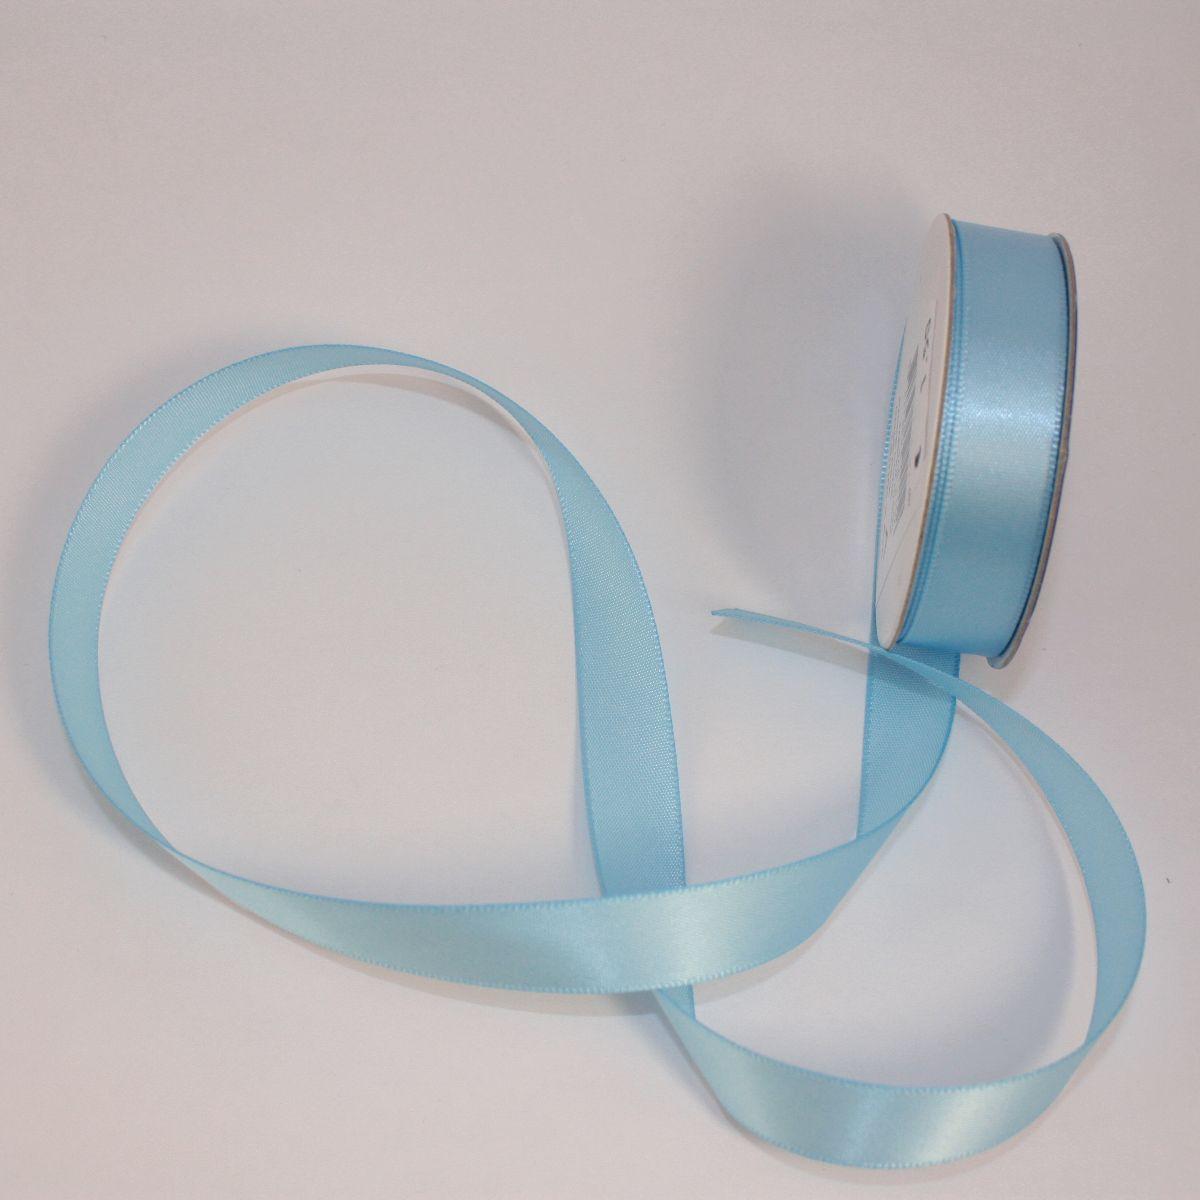 Ruban satin en bobine bleu ciel 13 mm